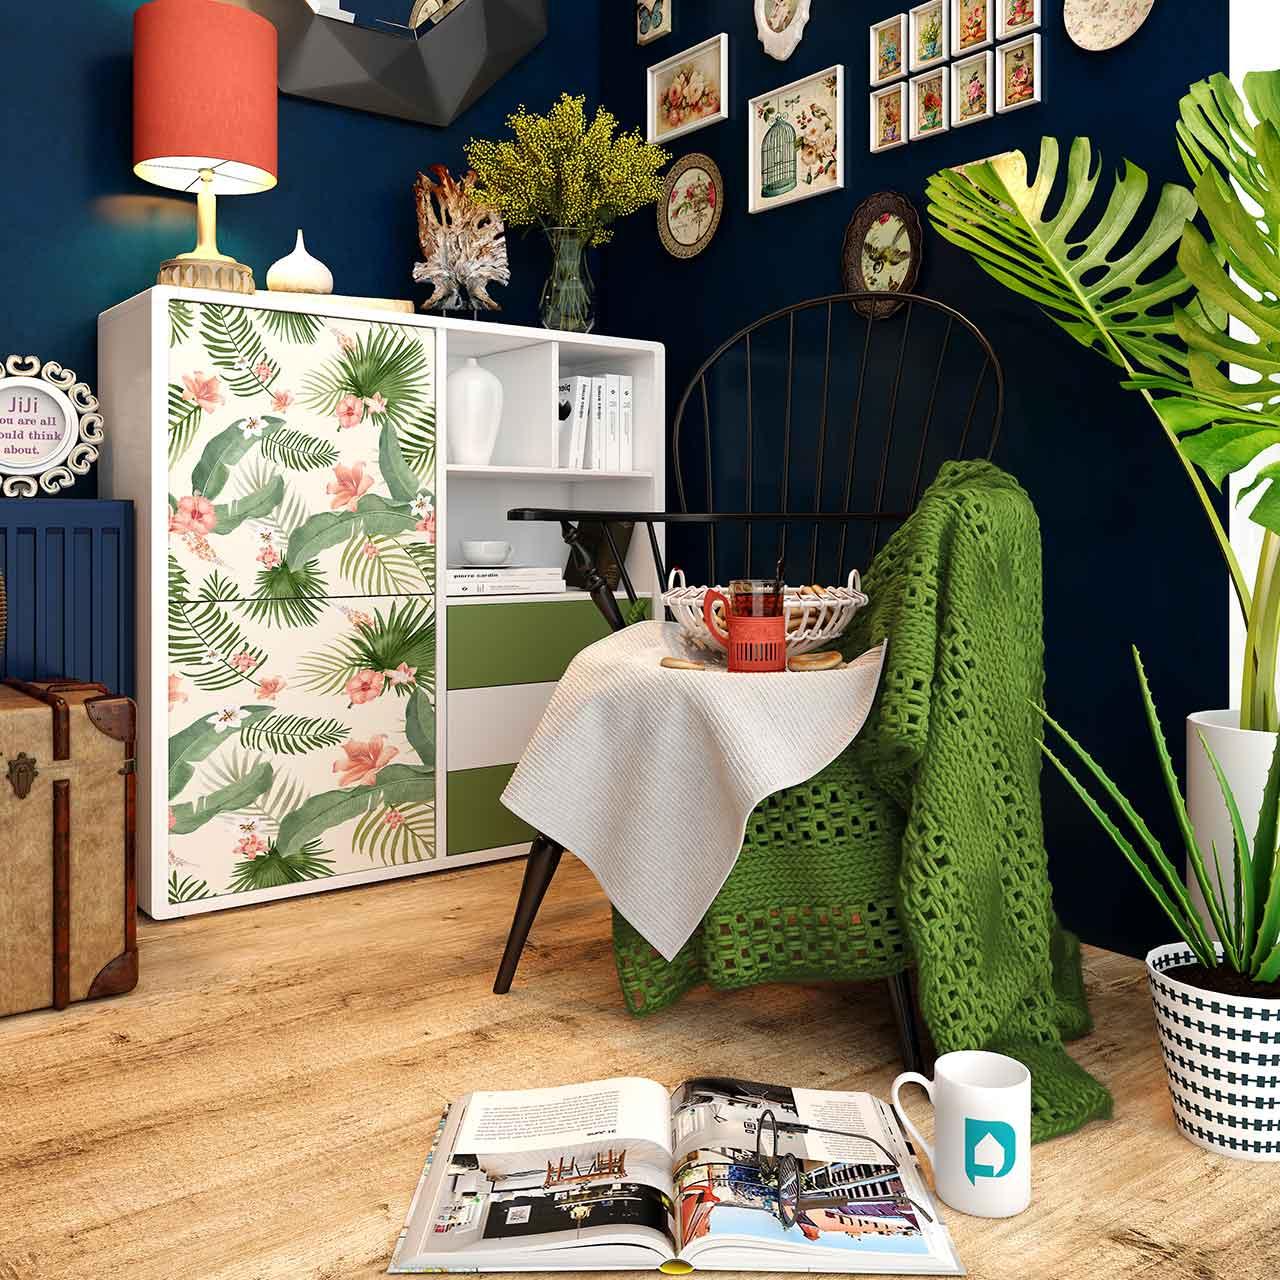 Open Spaces With Plenty Greenery